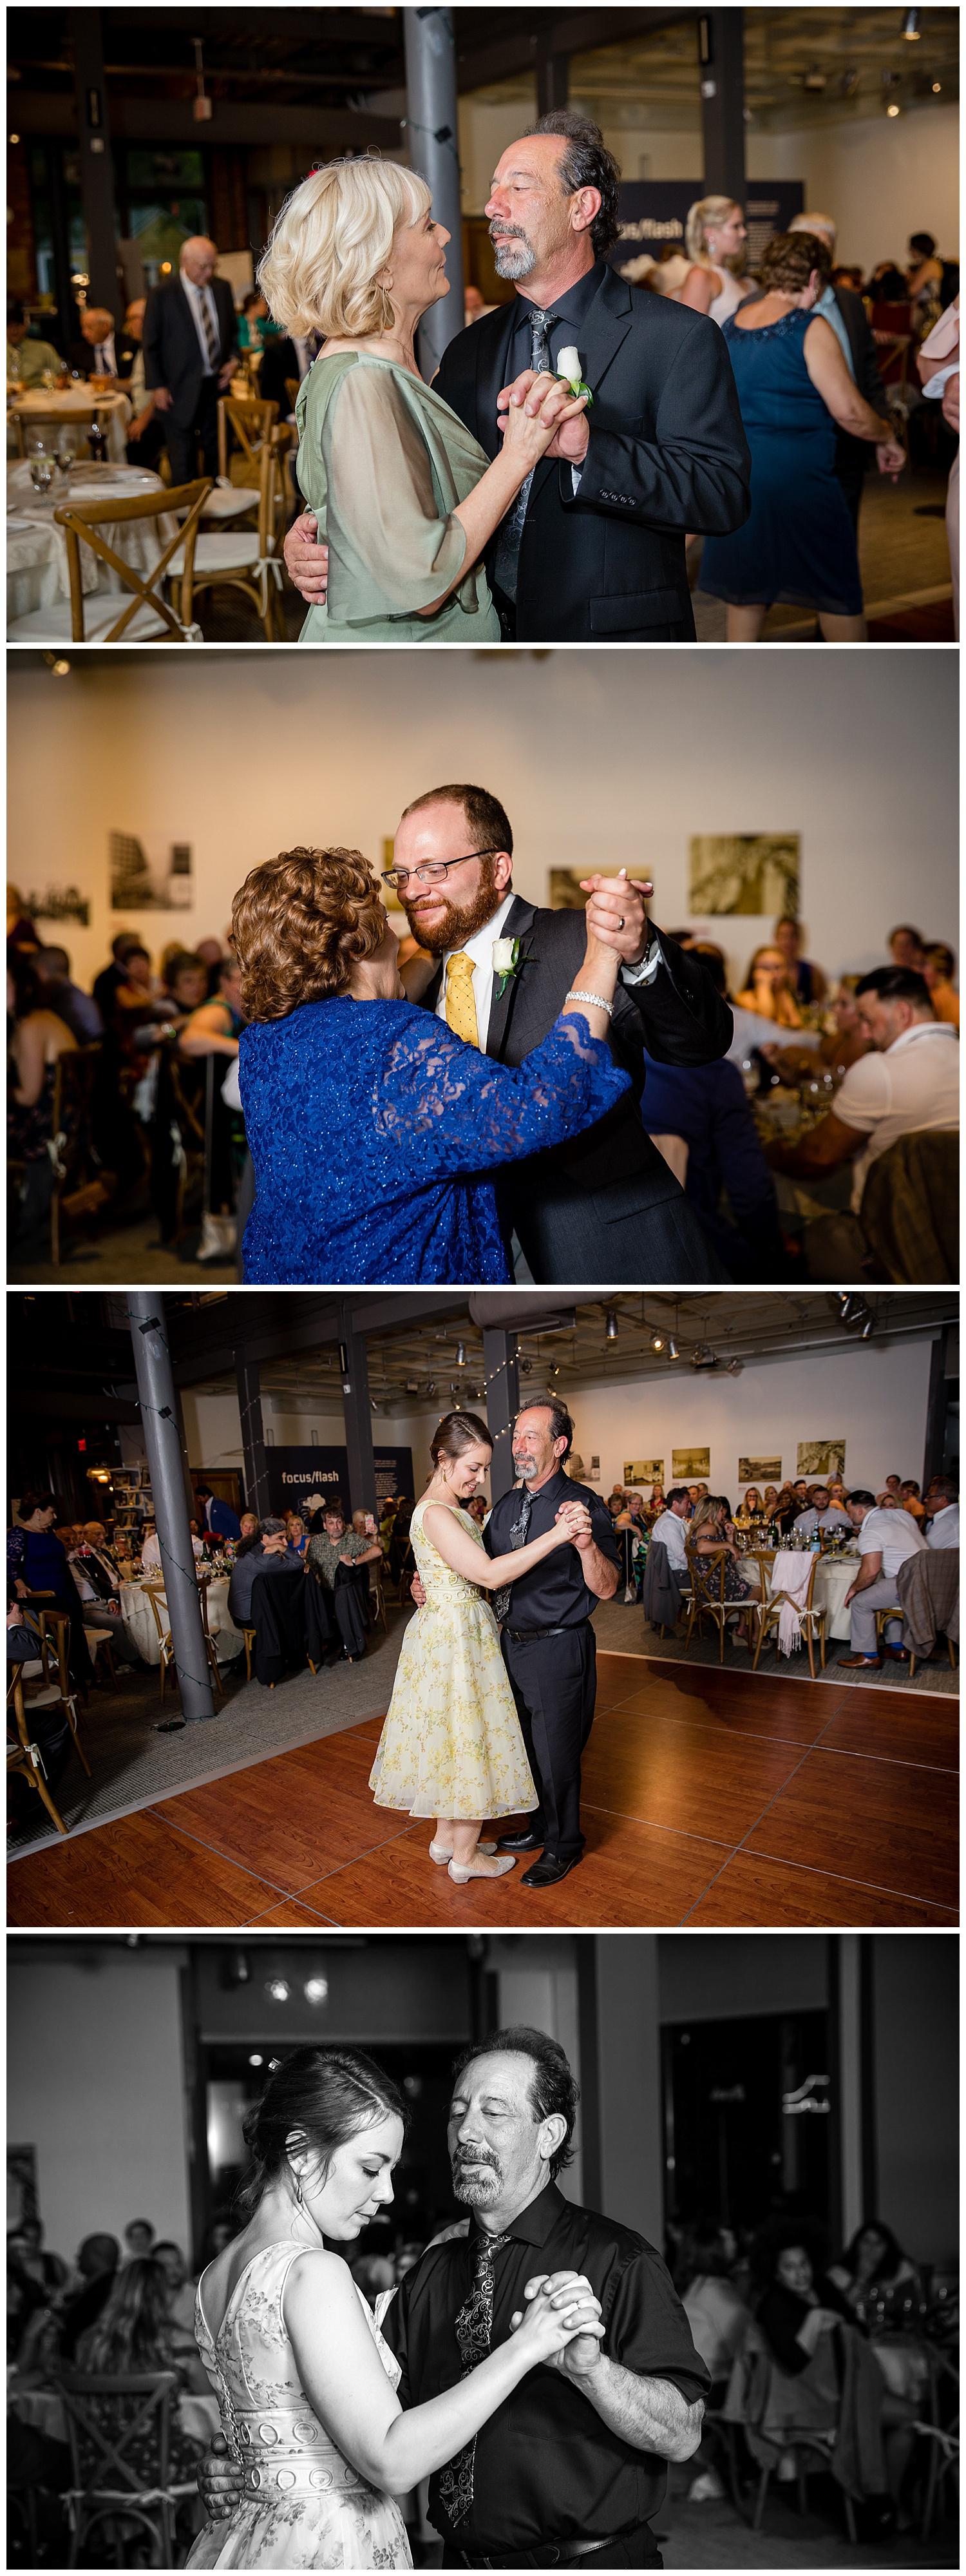 Lynn-Musuem-Wedding-Boston-Photographer-26-North-Studios-031.jpg